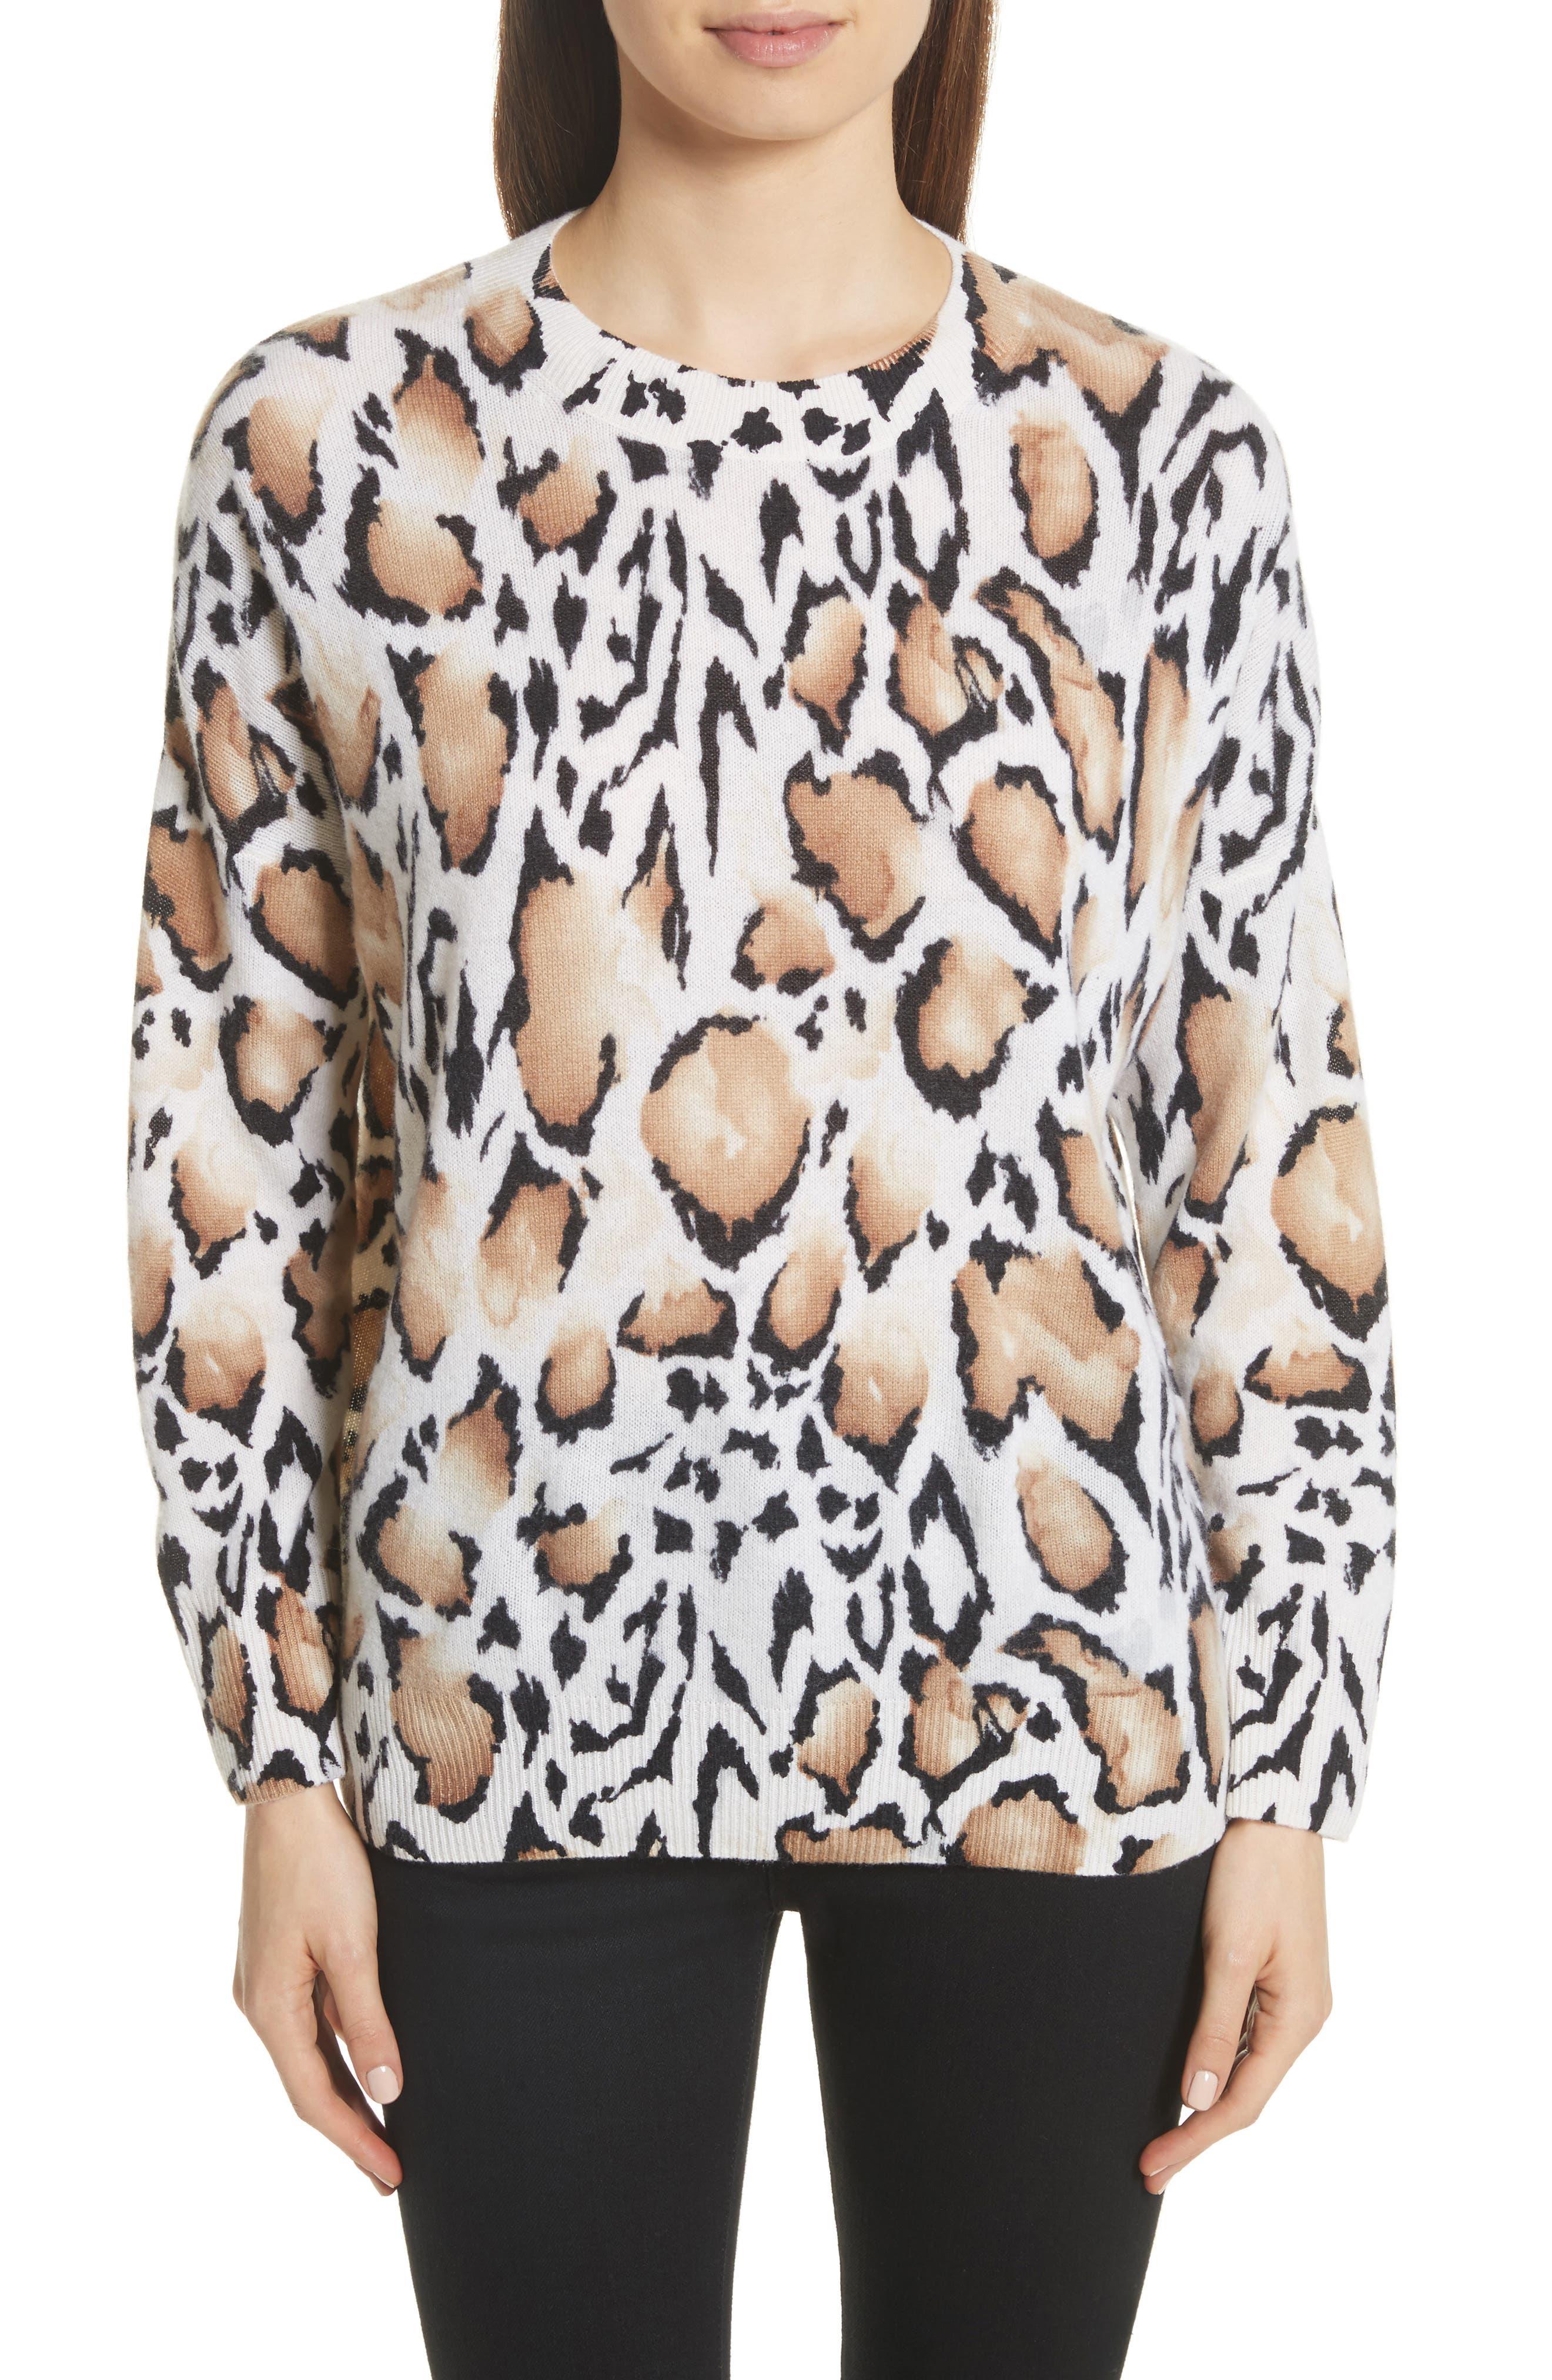 Main Image - Equipment Melanie Clouded Leopard Print Cashmere Sweater